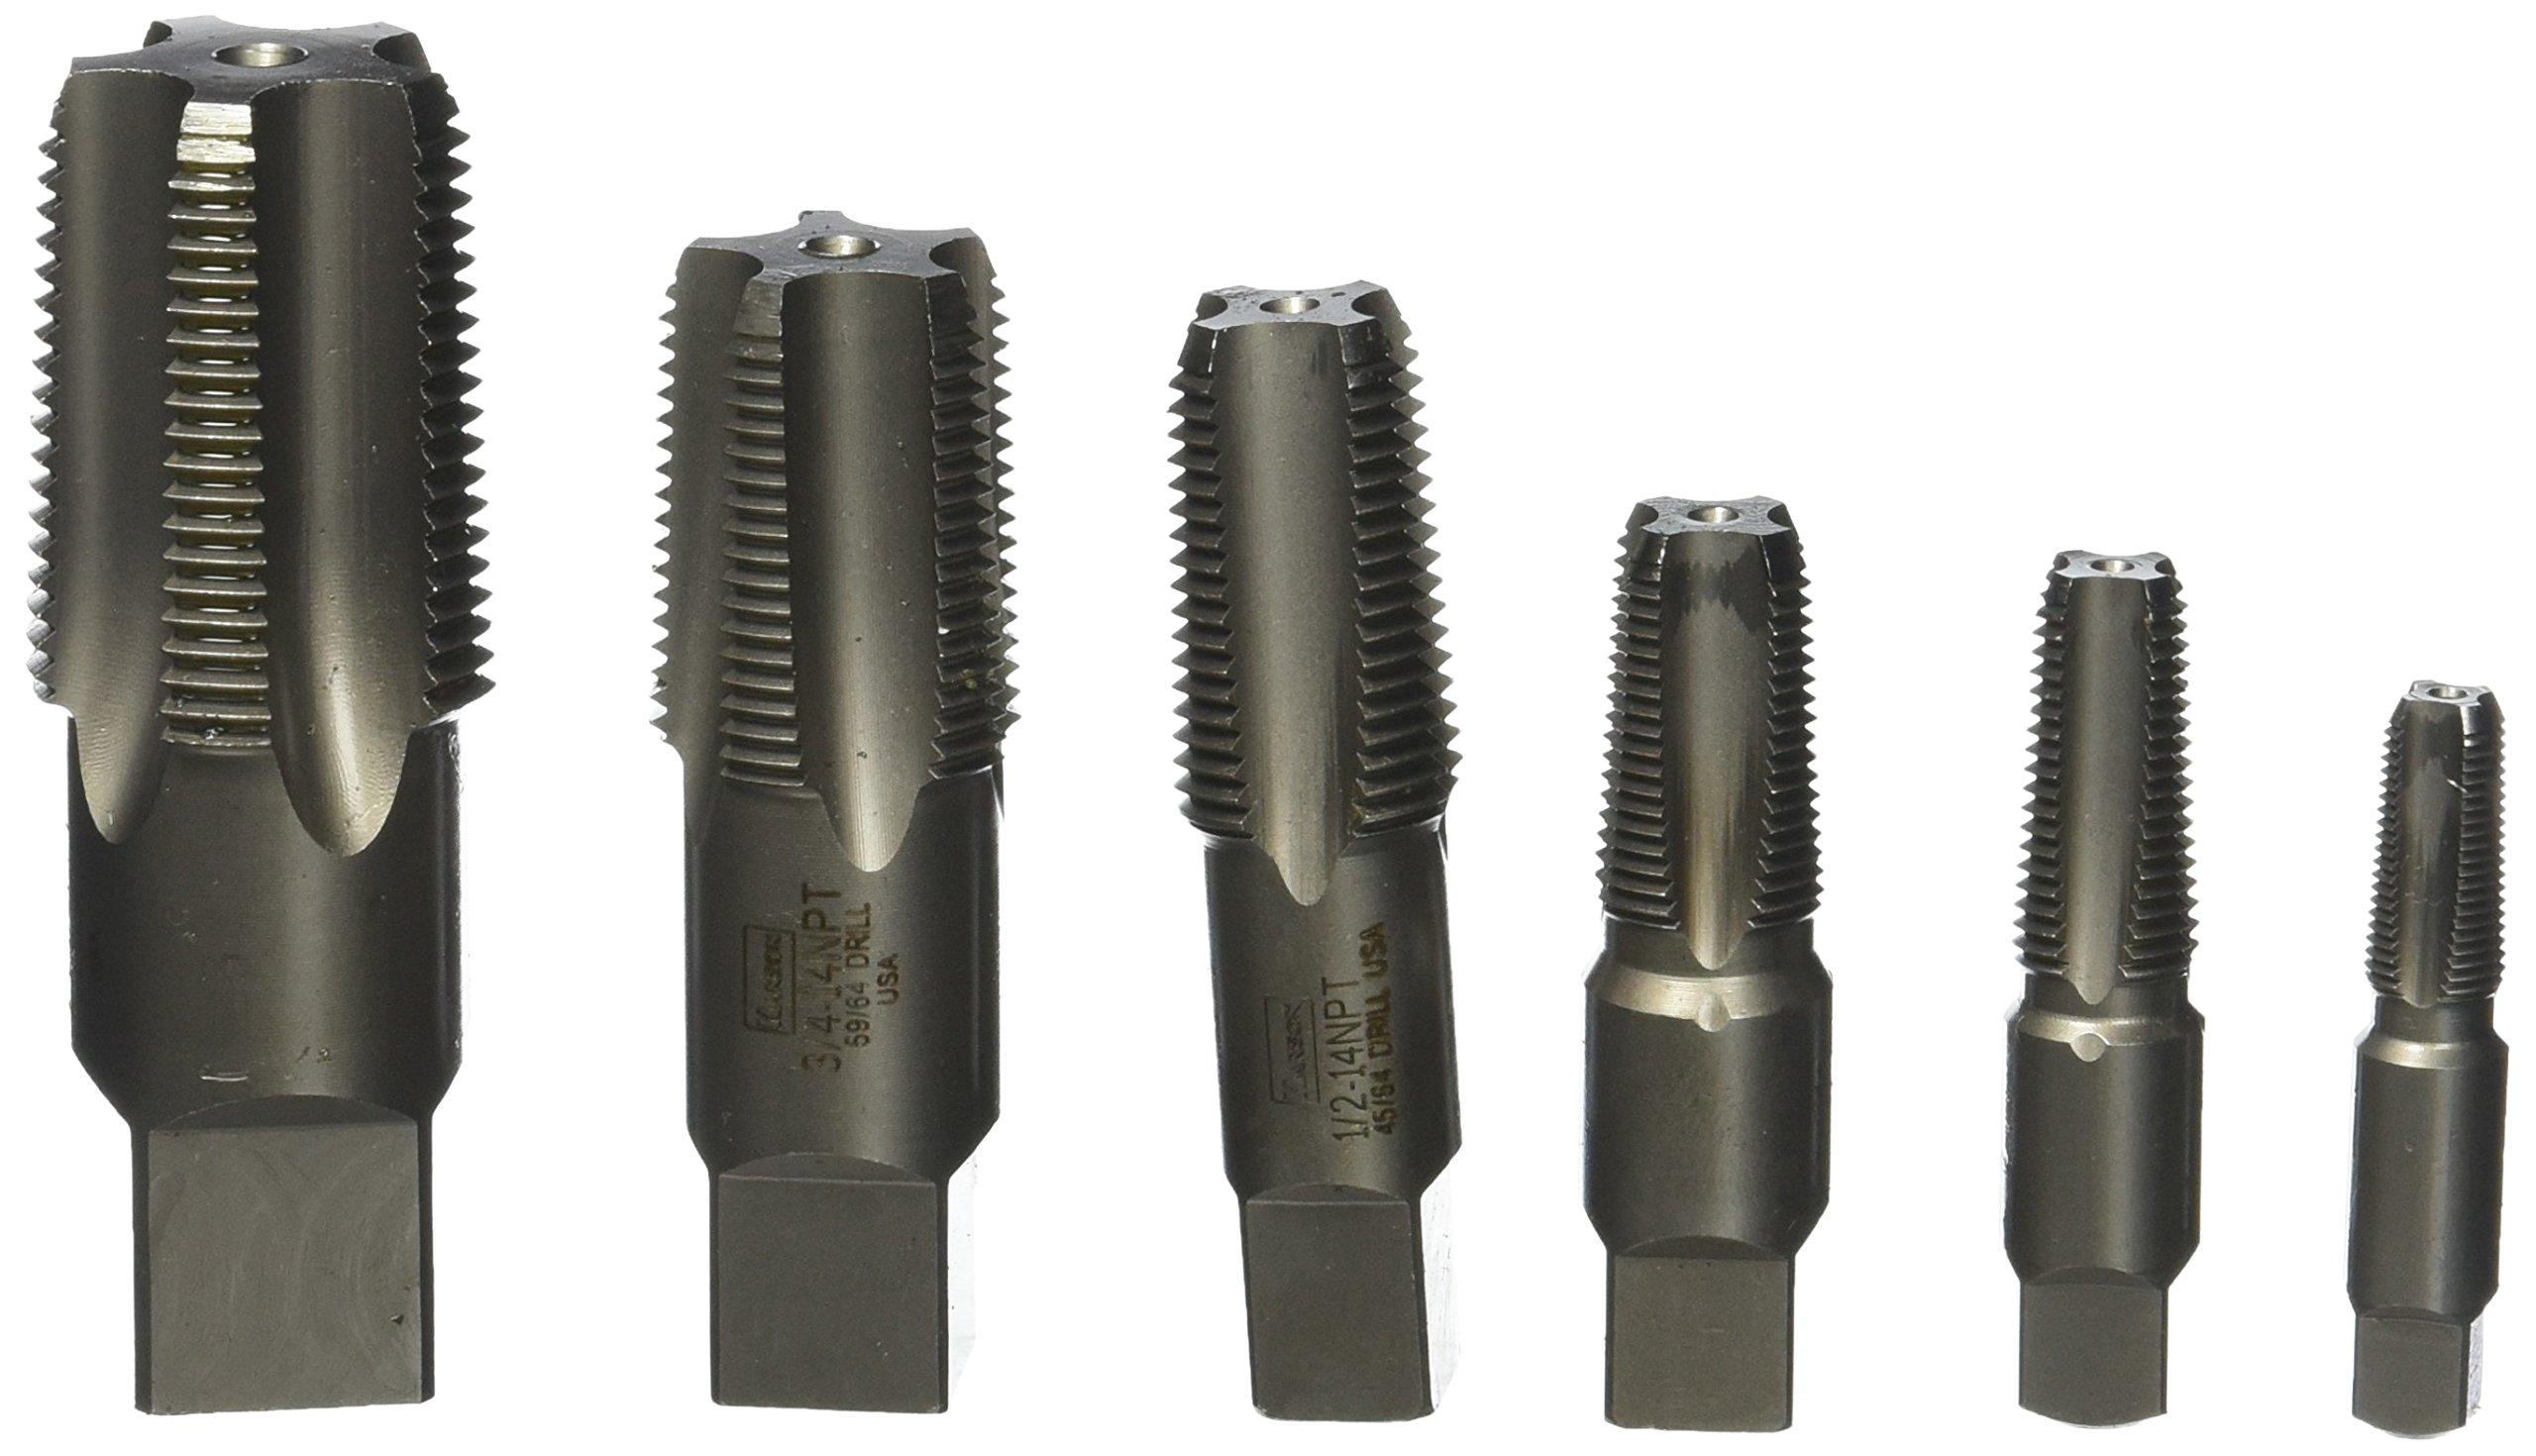 Irwin Industrial Tools 1921ZR Taper Pipe Tap Set, 6-Piece